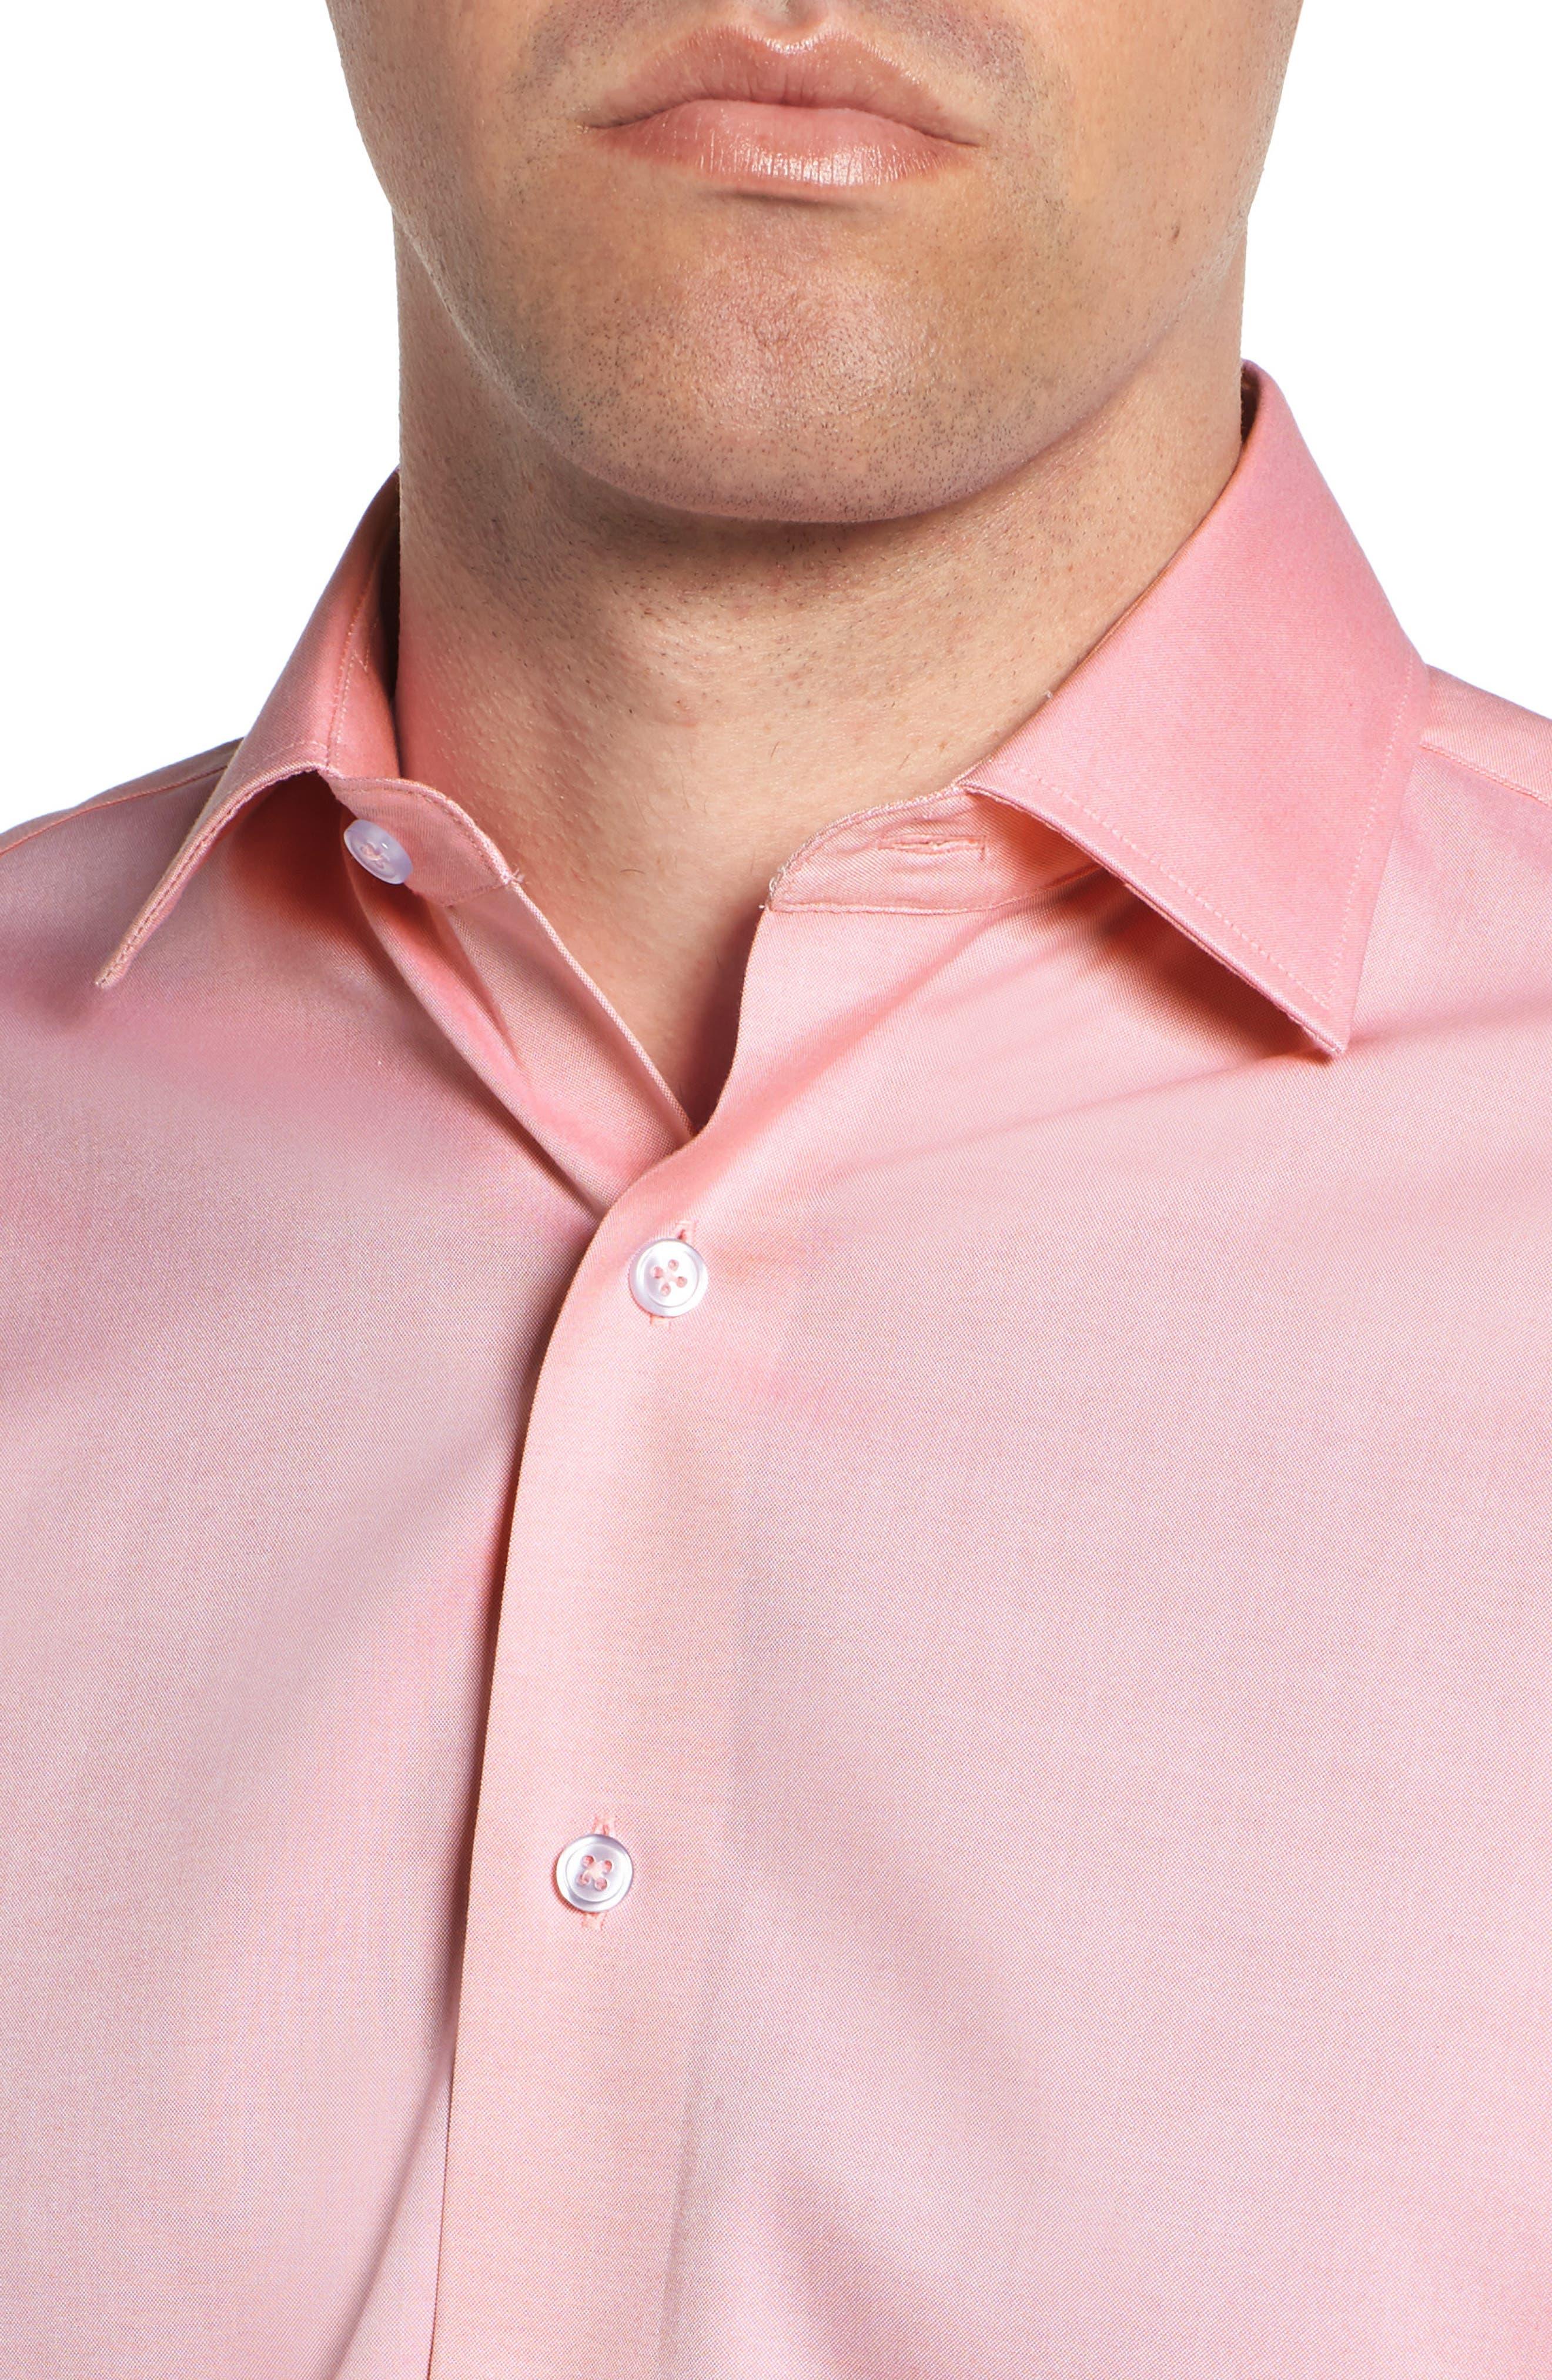 Trim Fit Solid Dress Shirt,                             Alternate thumbnail 2, color,                             PINK